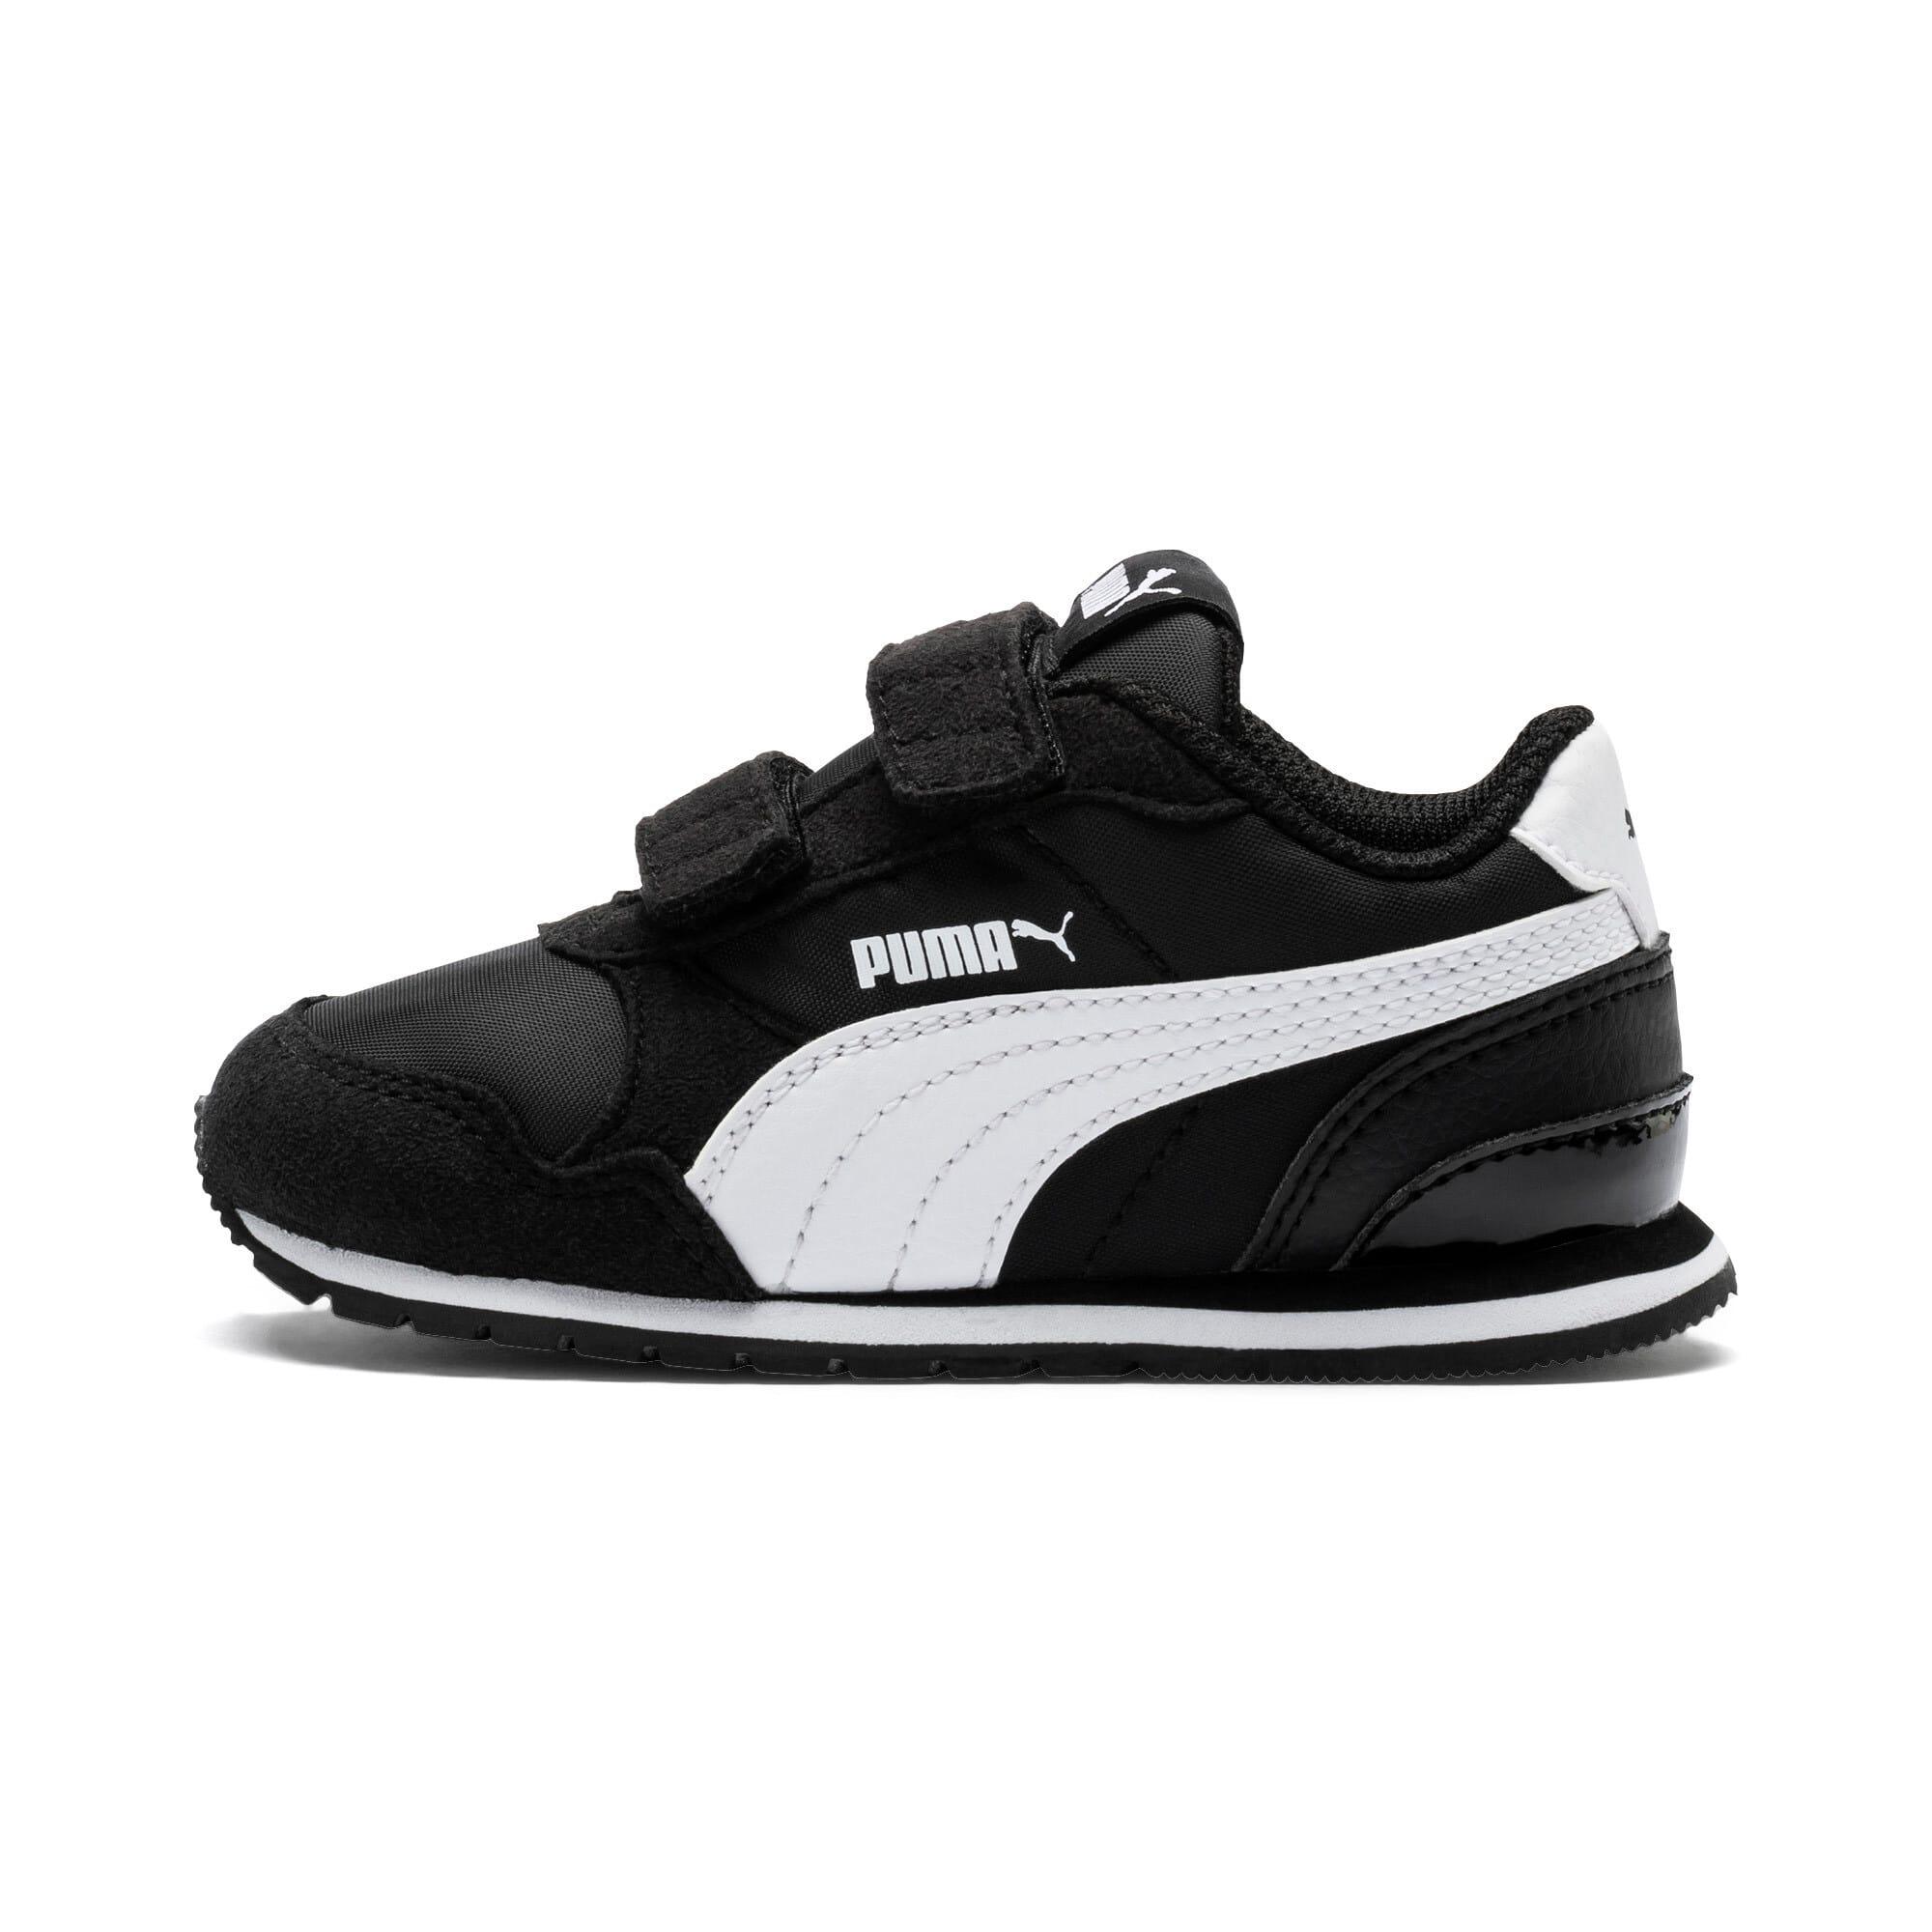 Thumbnail 1 of ST Runner v2 Little Kids' Shoes, Puma Black-Puma White, medium